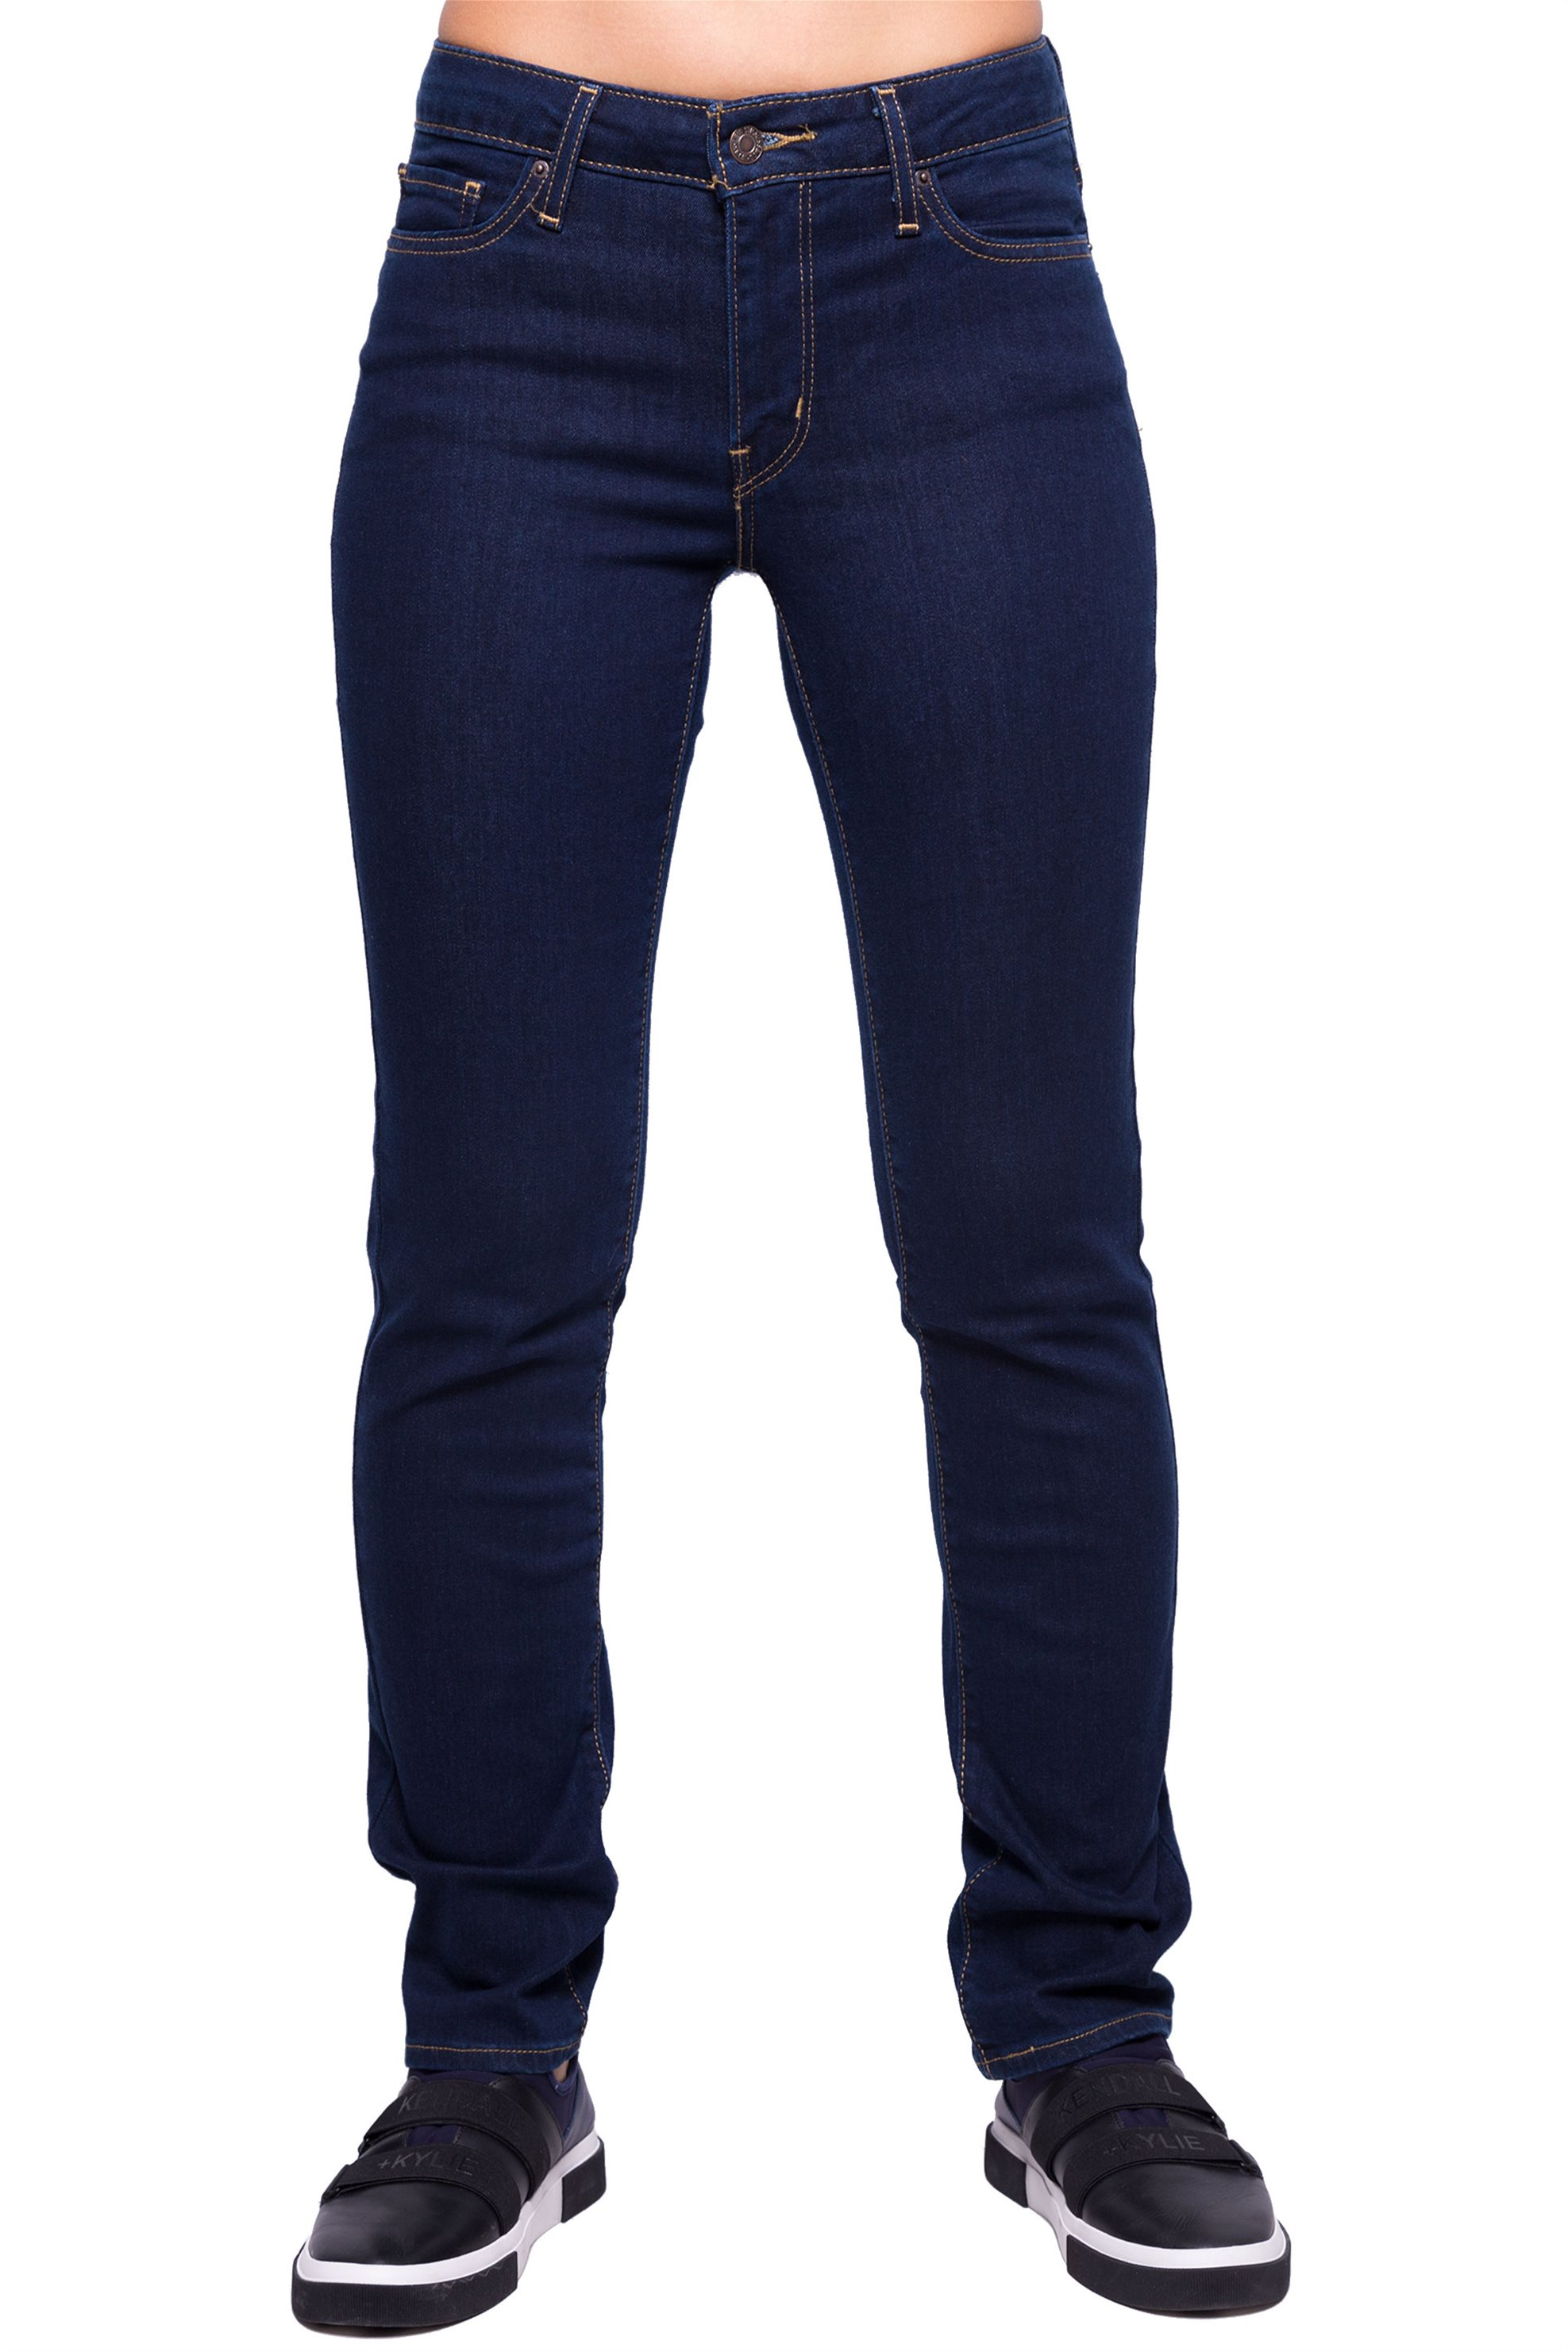 b750da040be παντελόνι | Γυναικεία Παντελόνια (Ταξινόμηση: Ακριβότερα) | Σελίδα ...